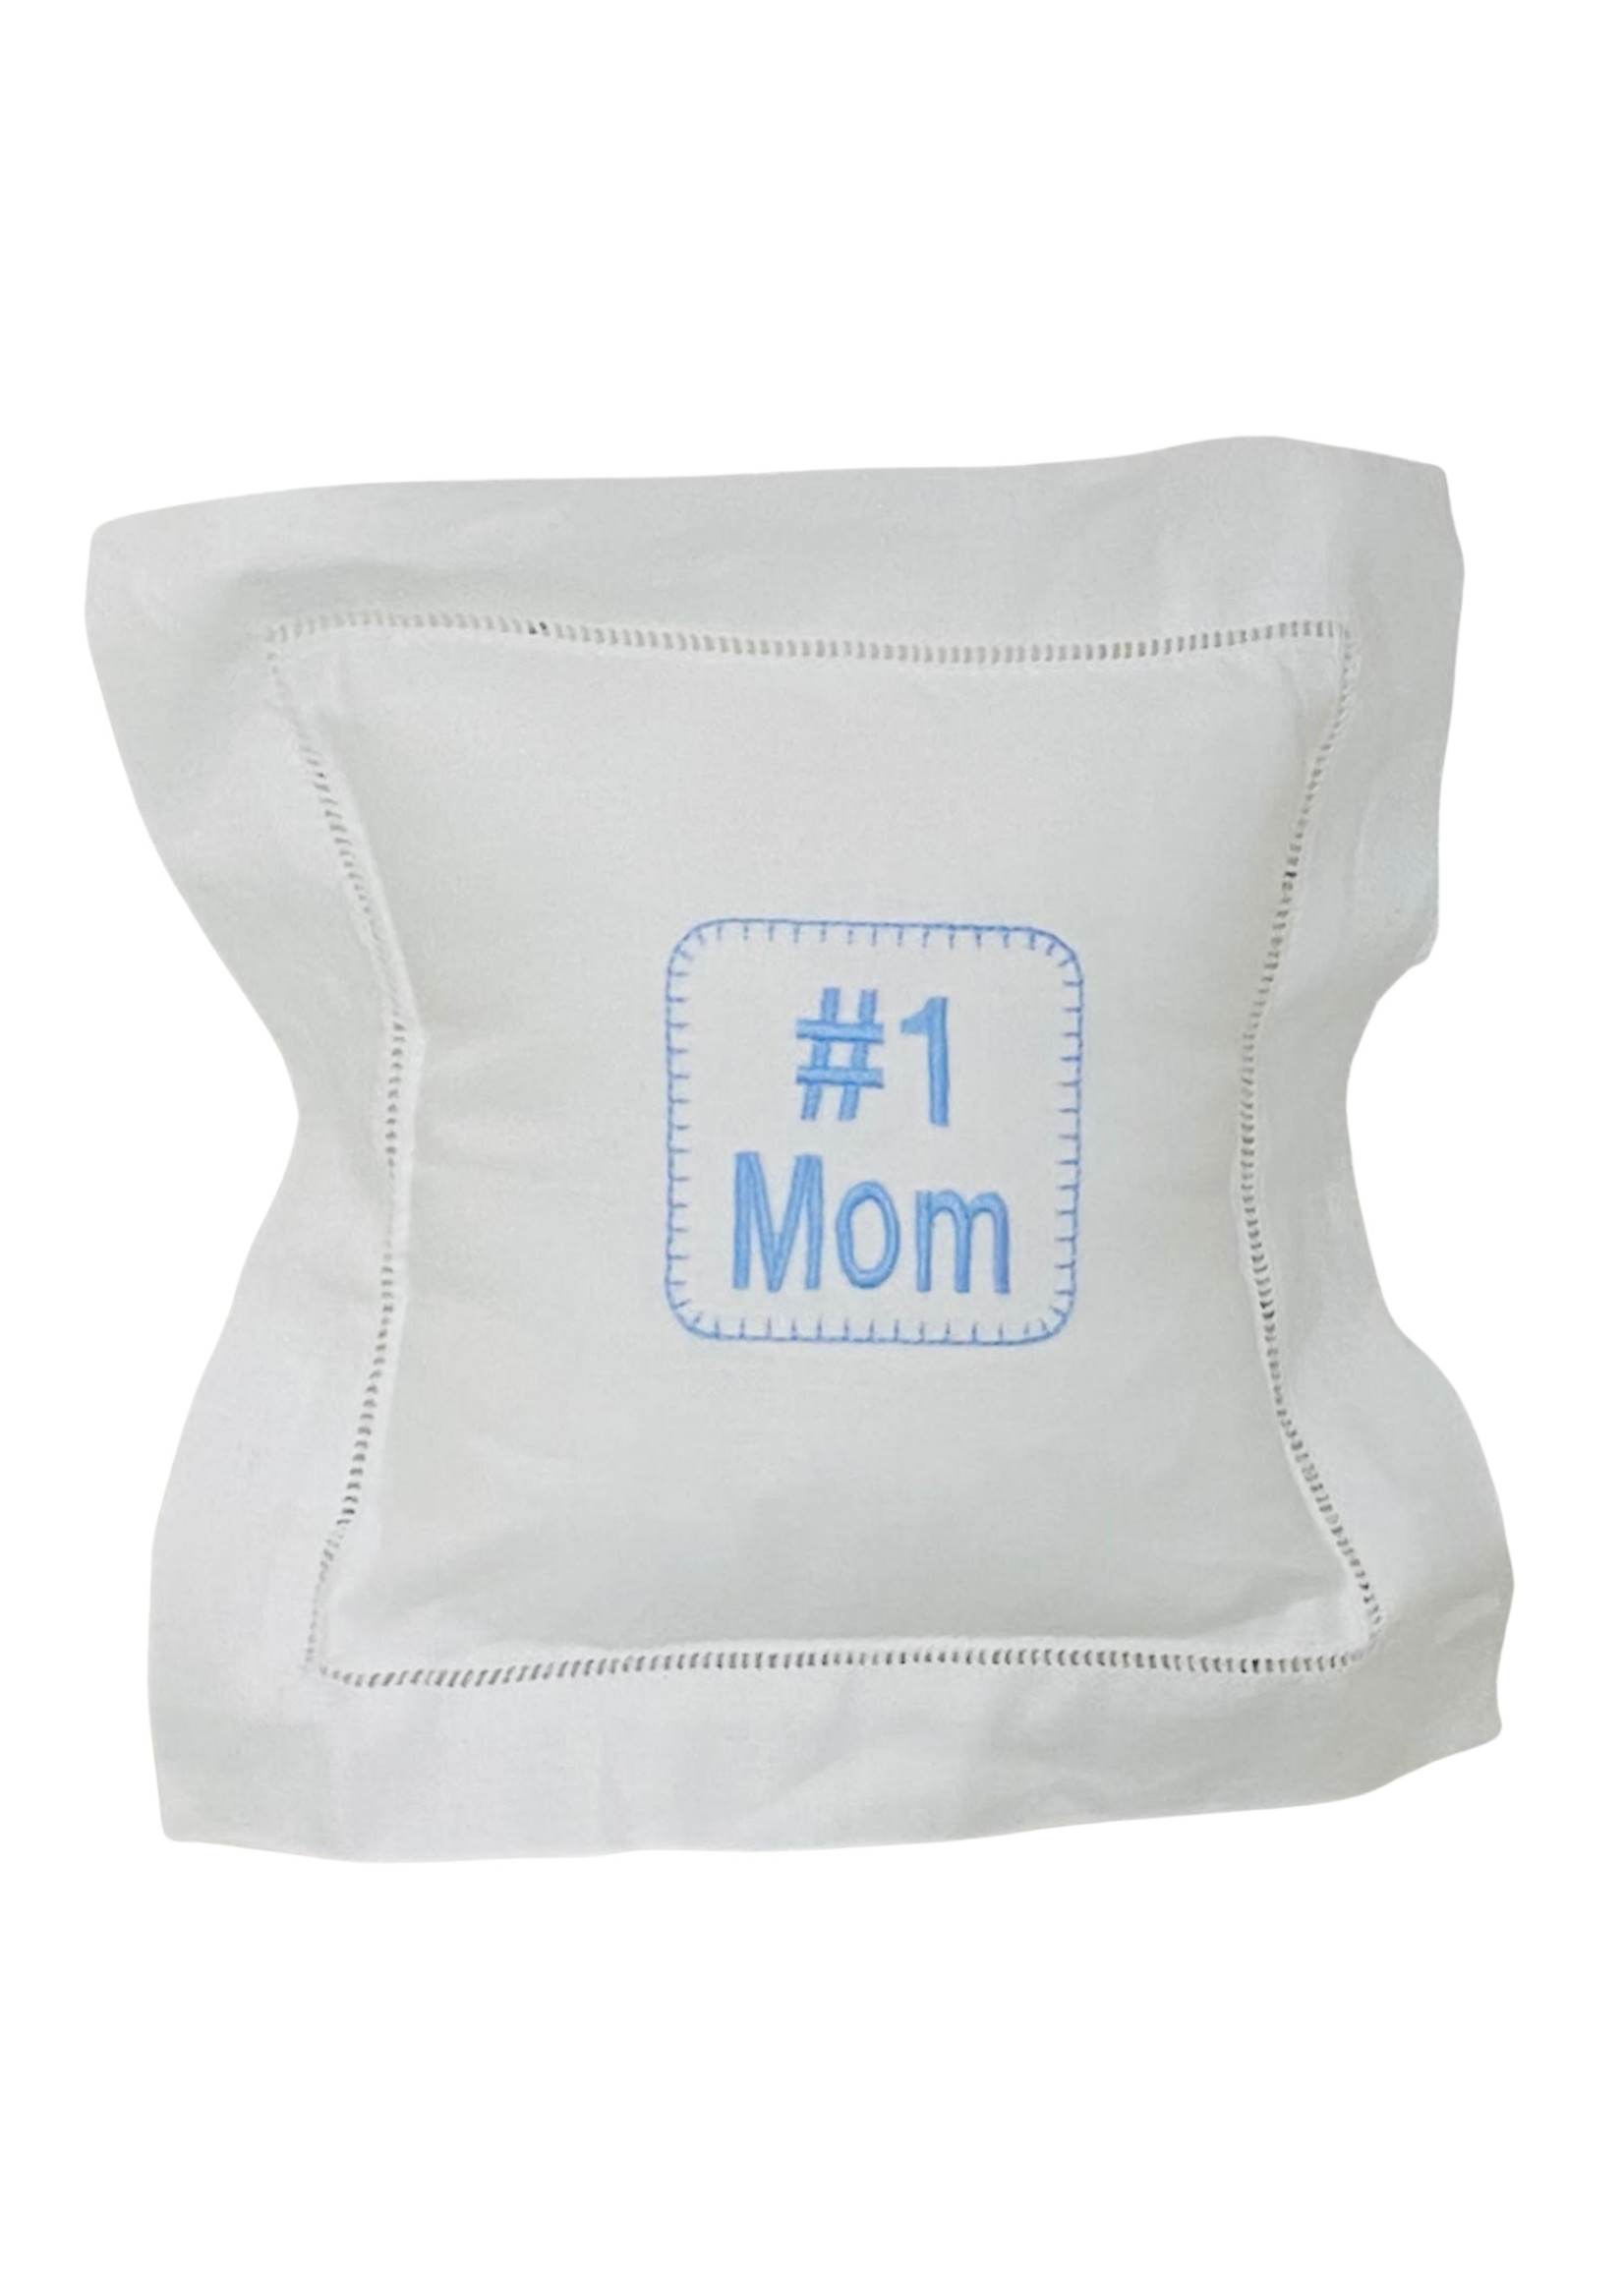 """#1 Mom"" Pillow"